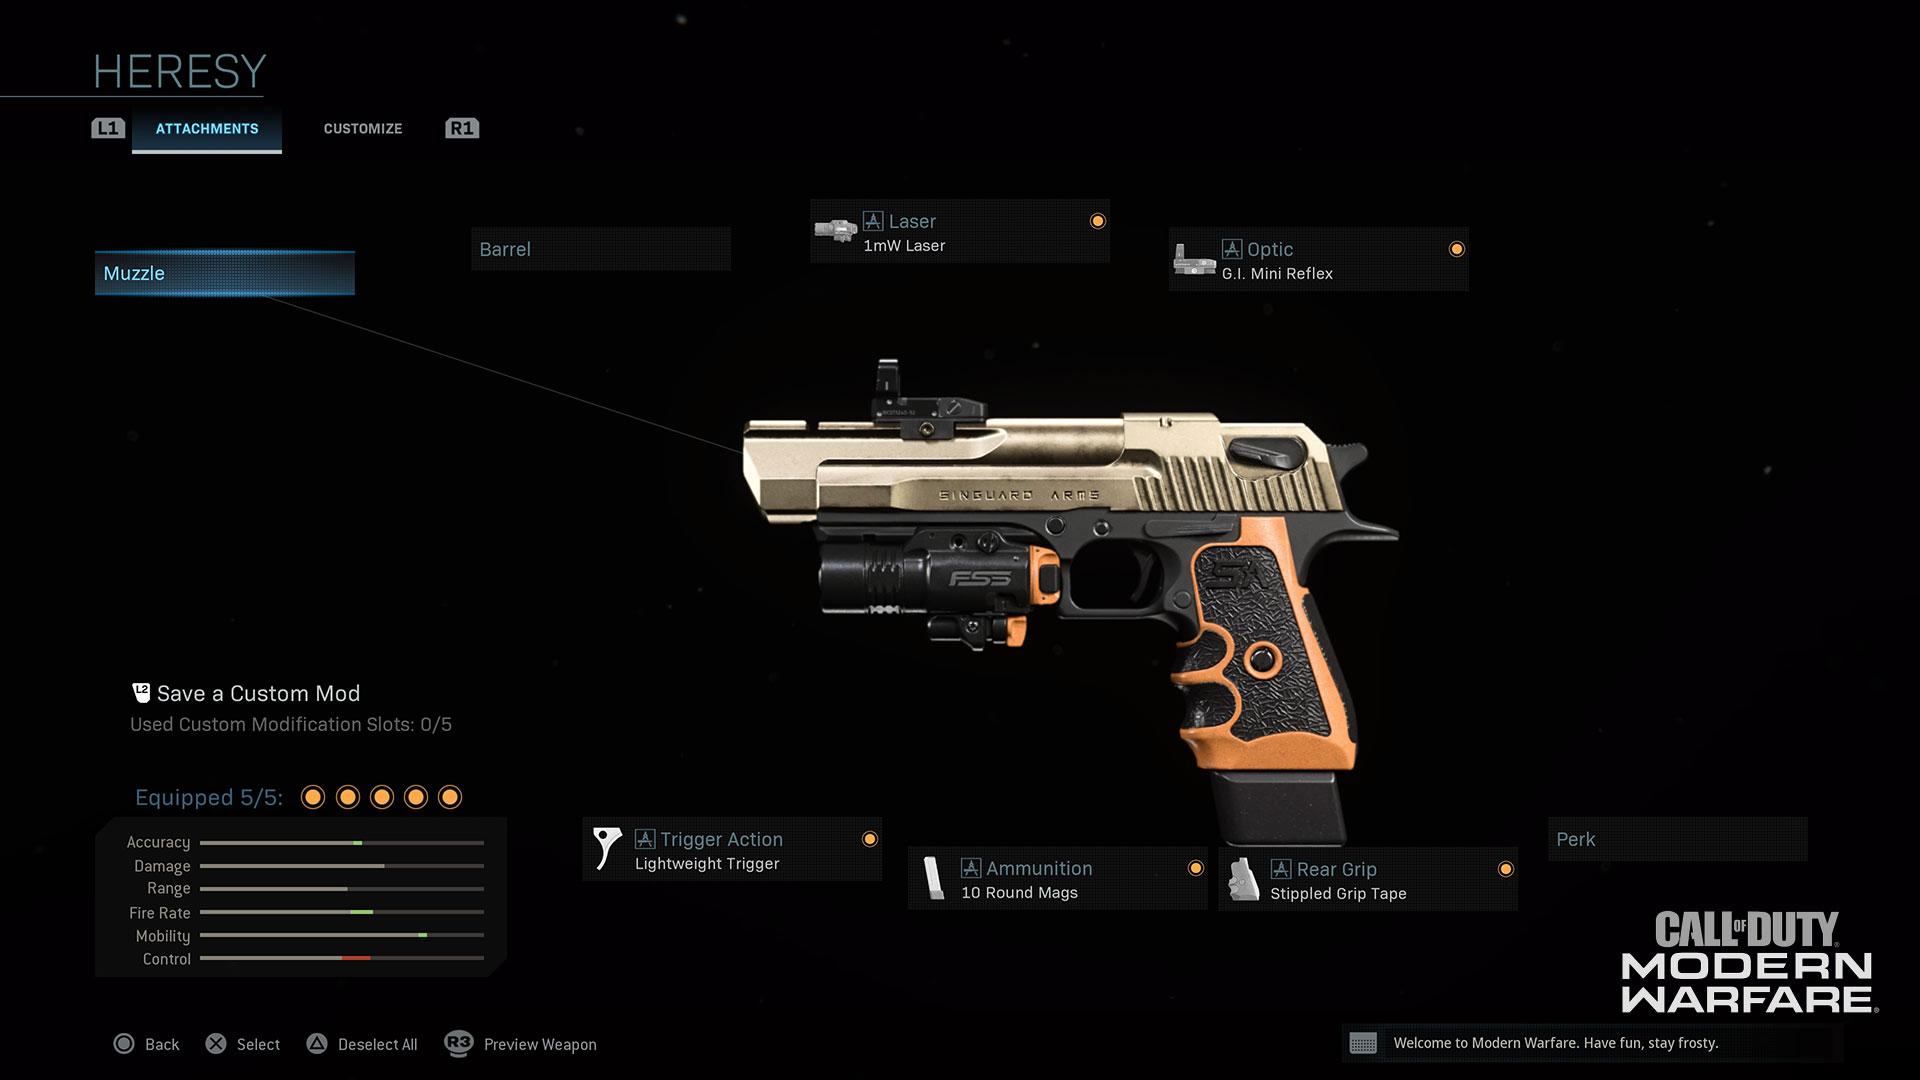 Heresy weapon skin